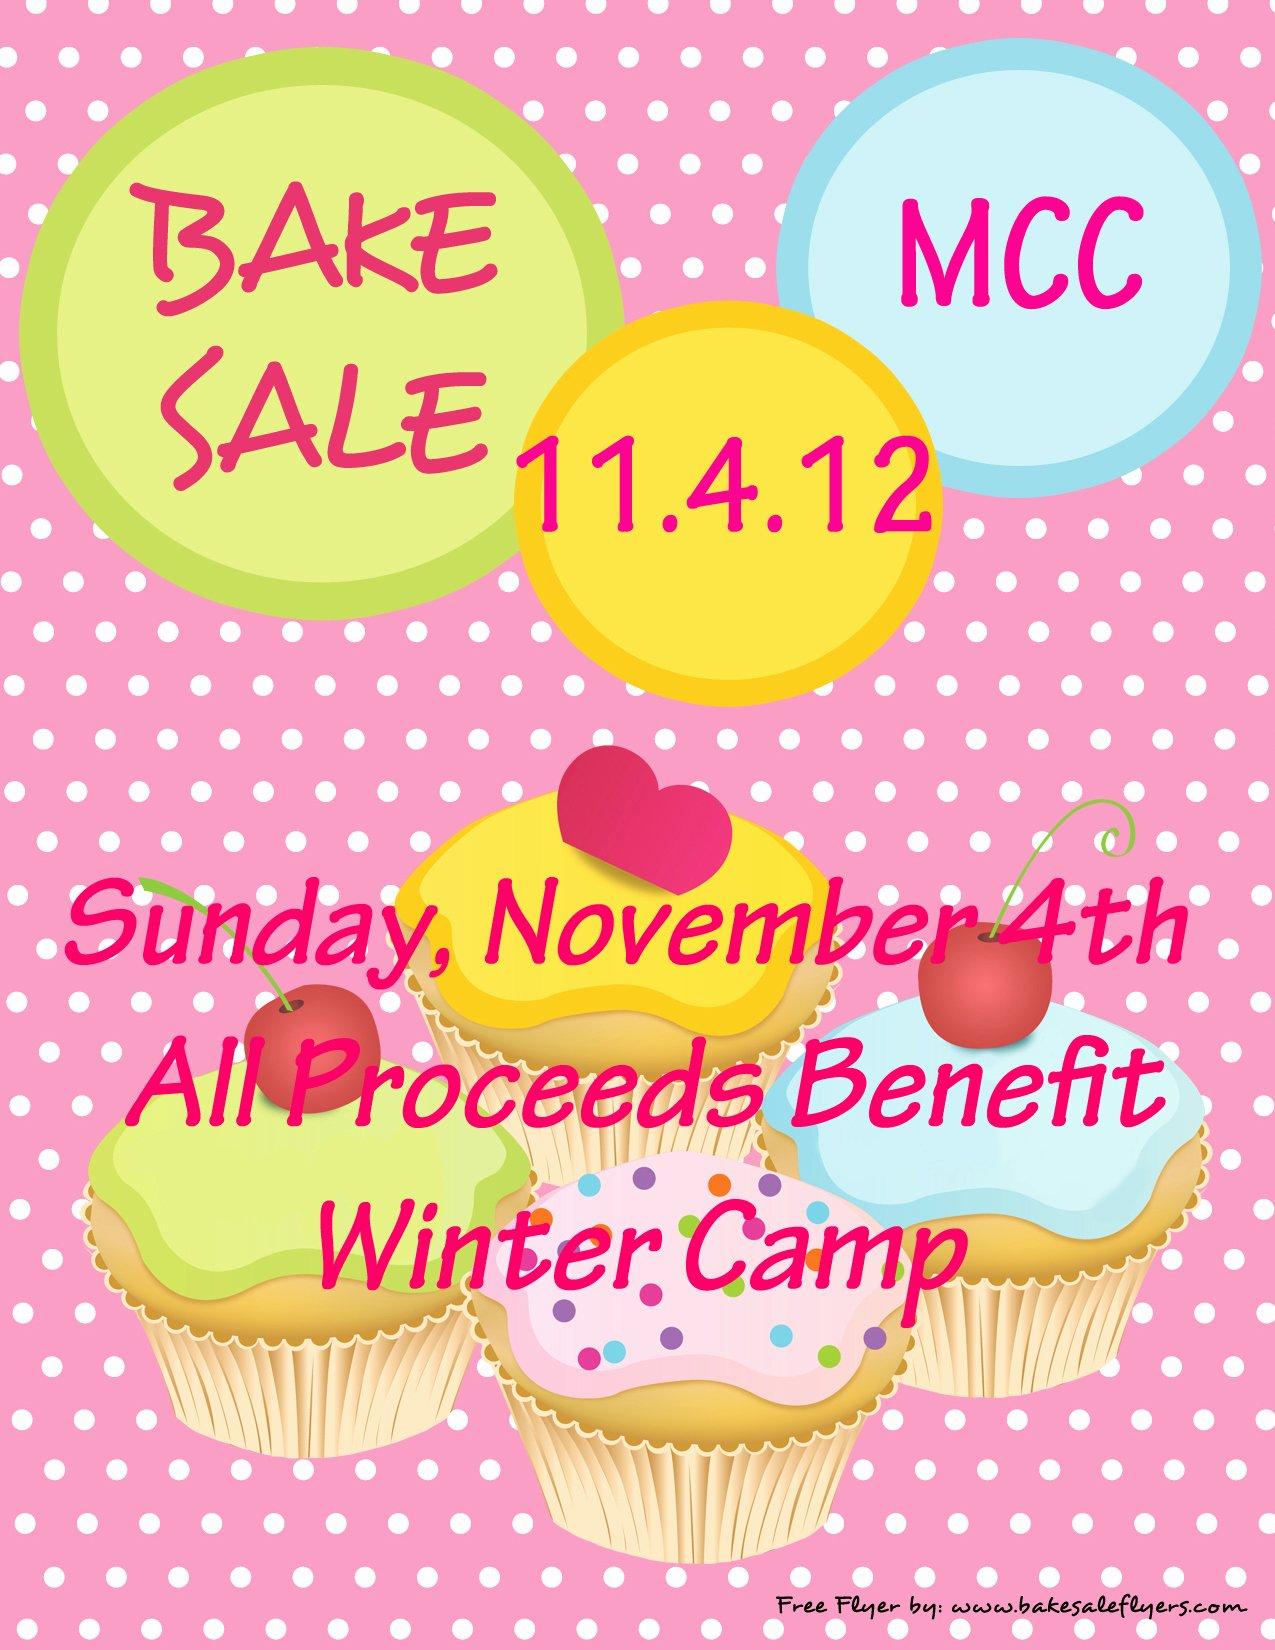 Bake Sale Flyer Template Word Luxury Bake Sale Fundraiser